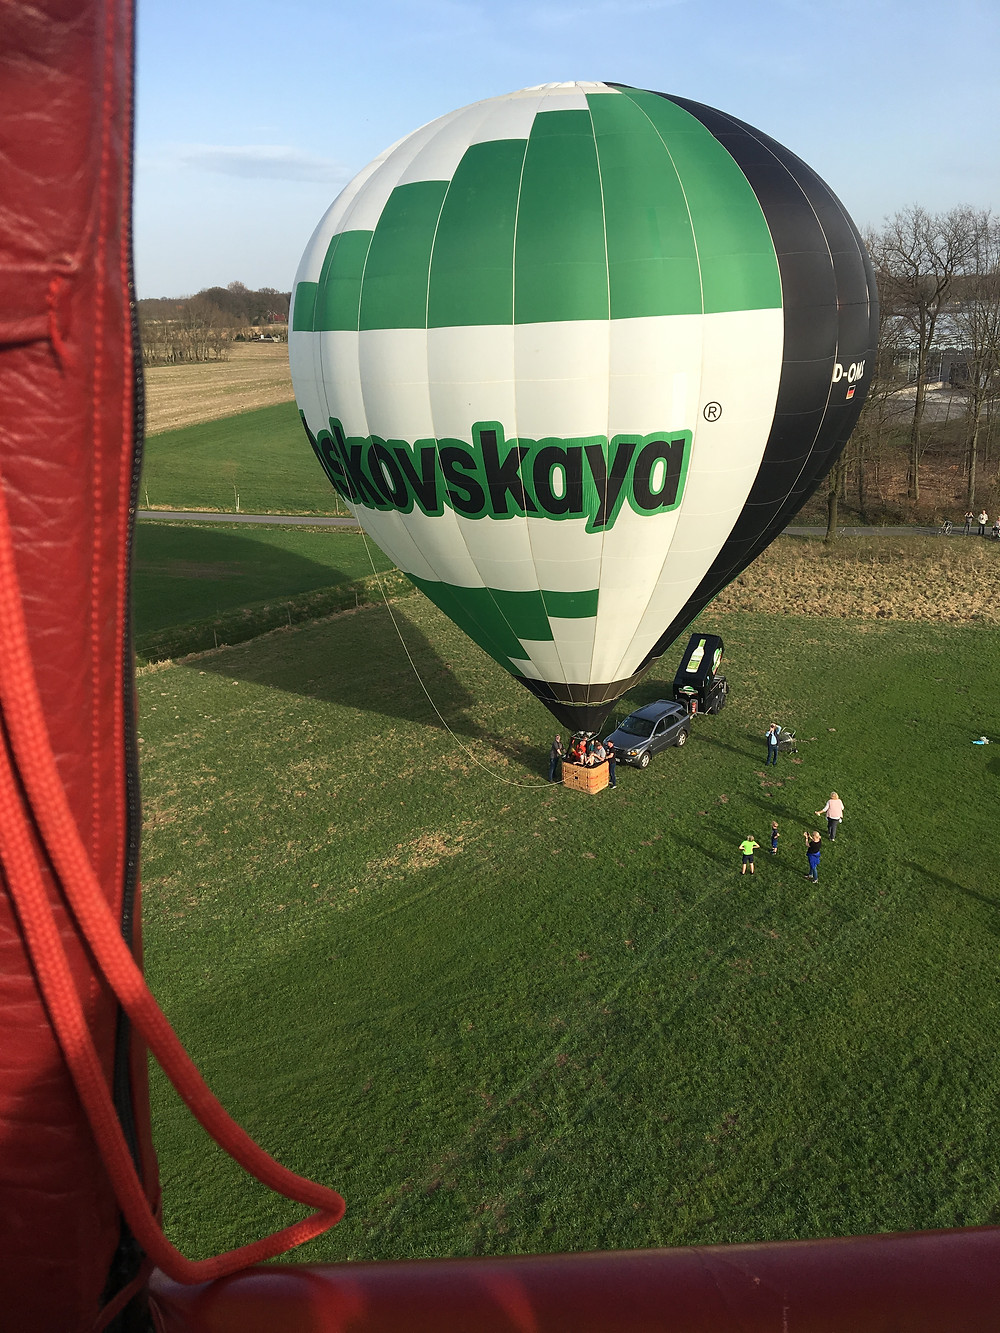 Himmelsriesen Ballonteam beim Start mit dem Moskovskaya Ballon